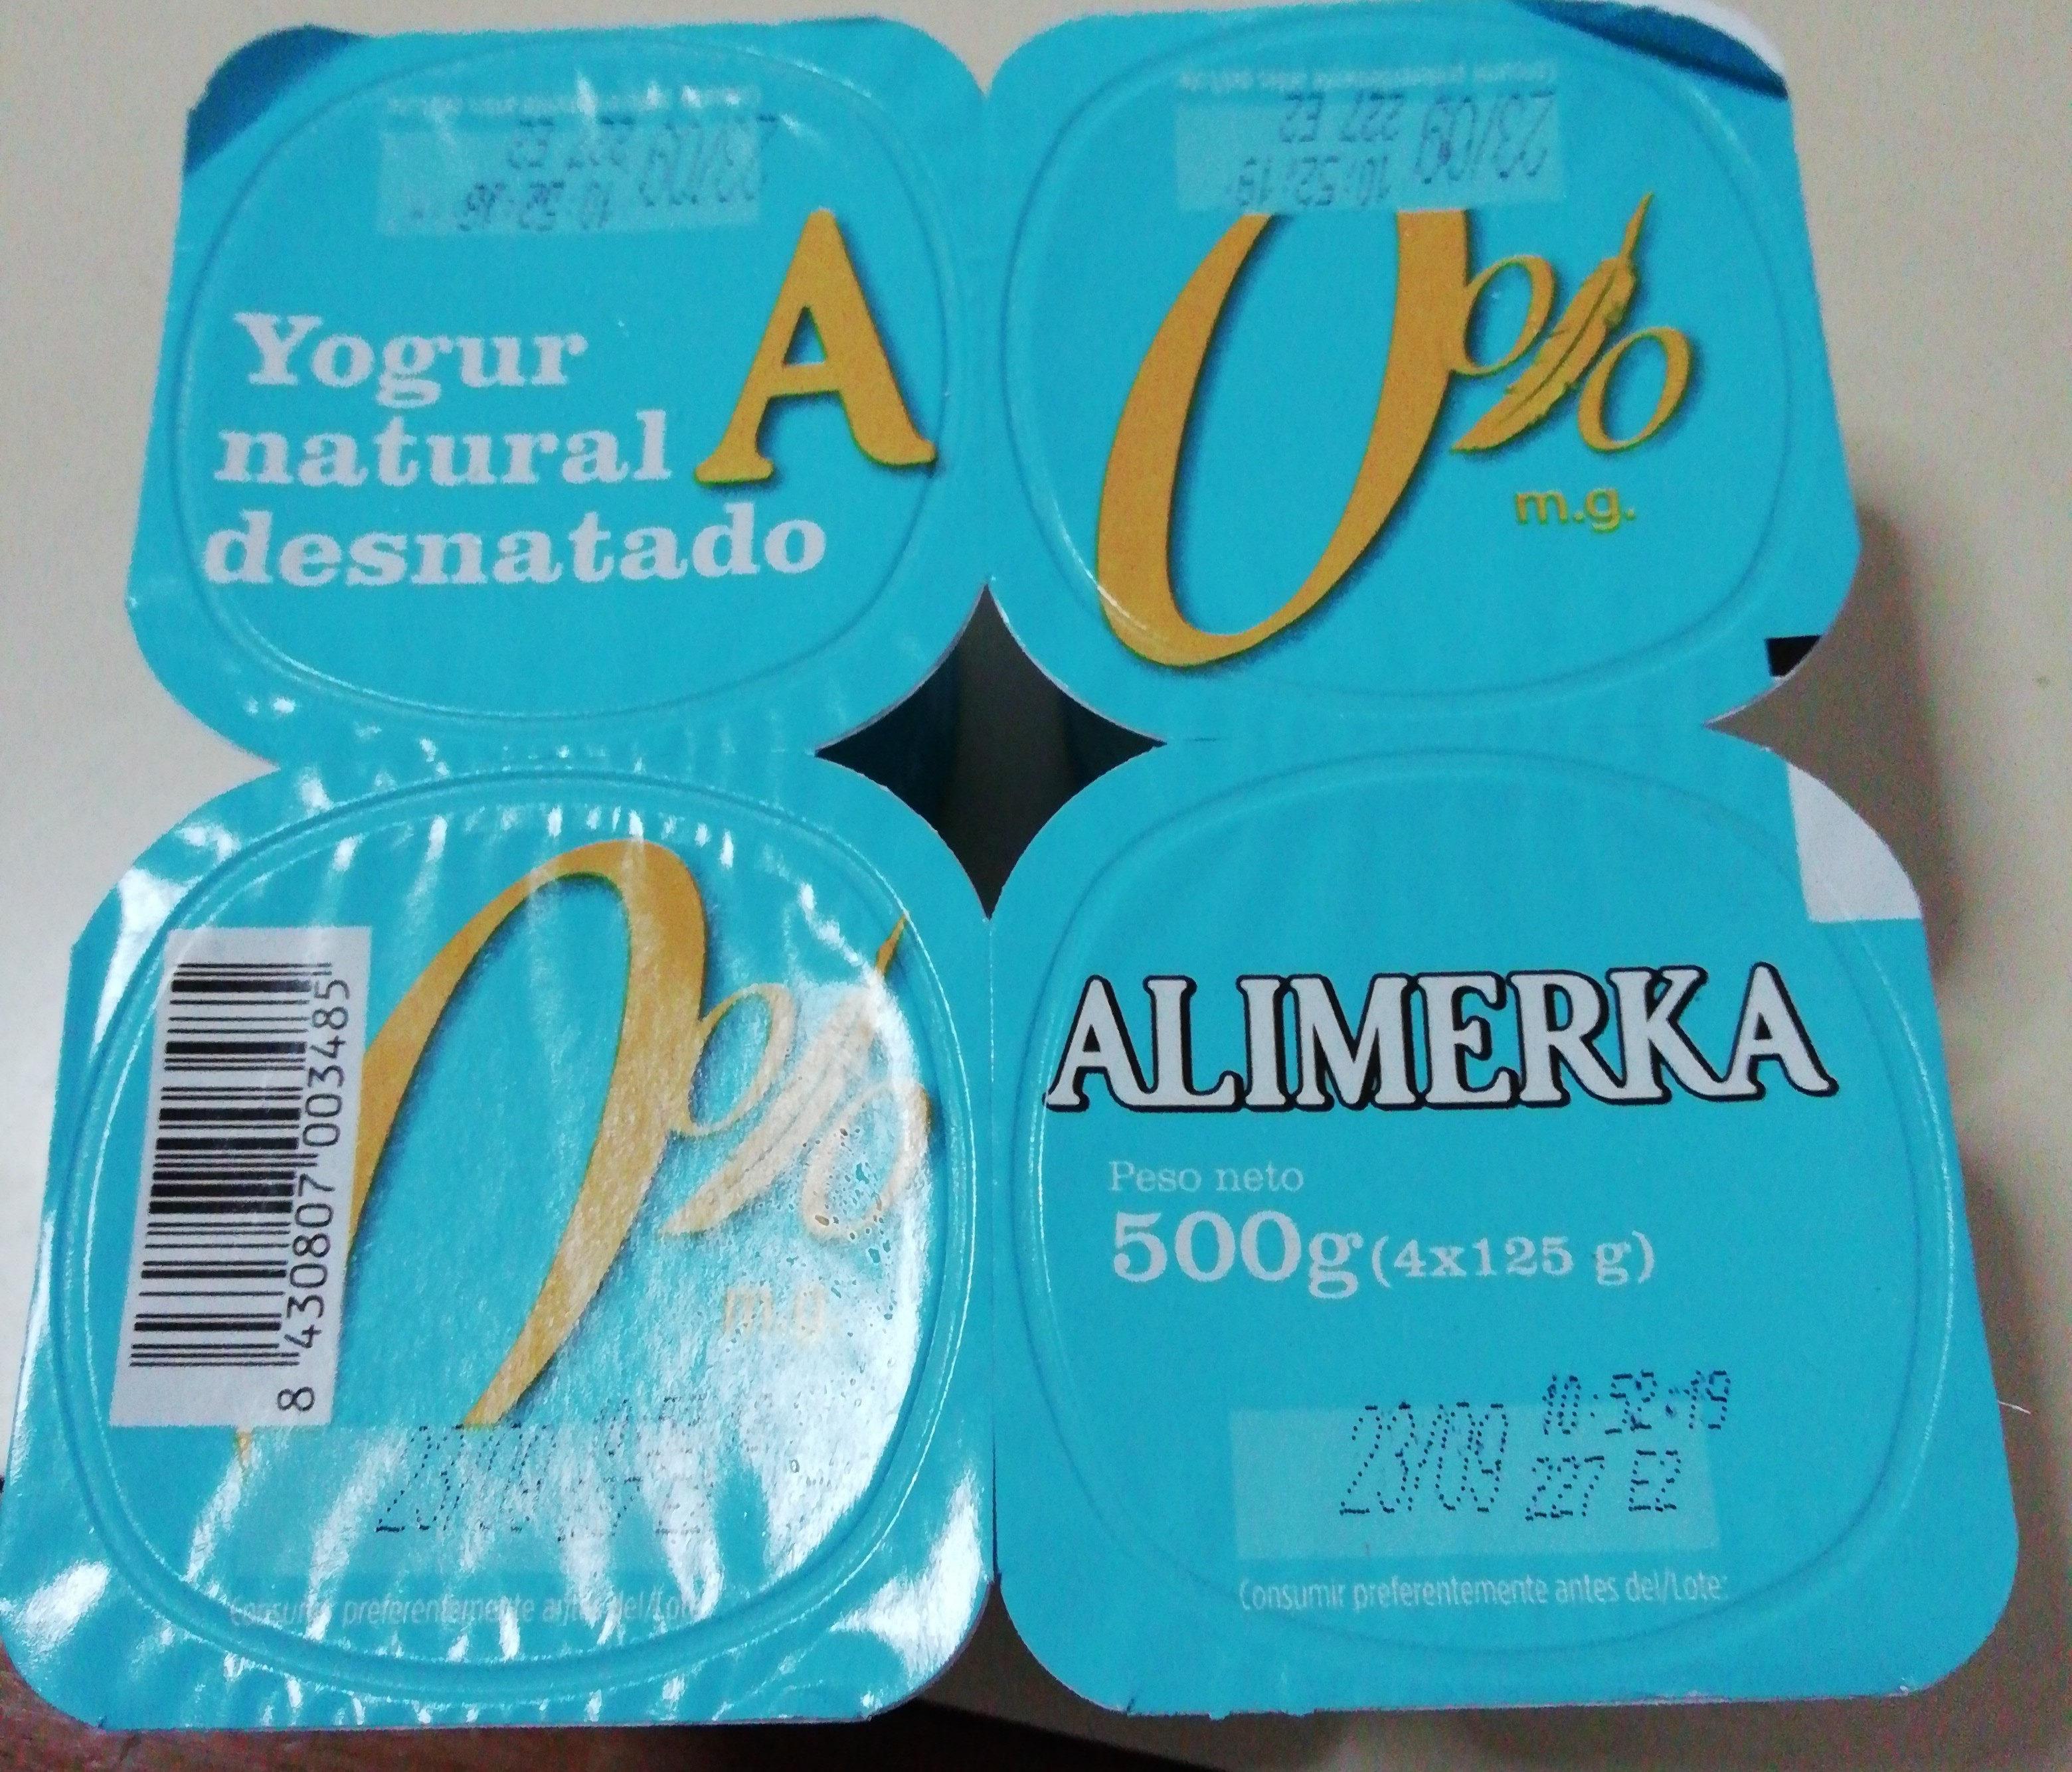 Yogur natural desnatado 0% - Producto